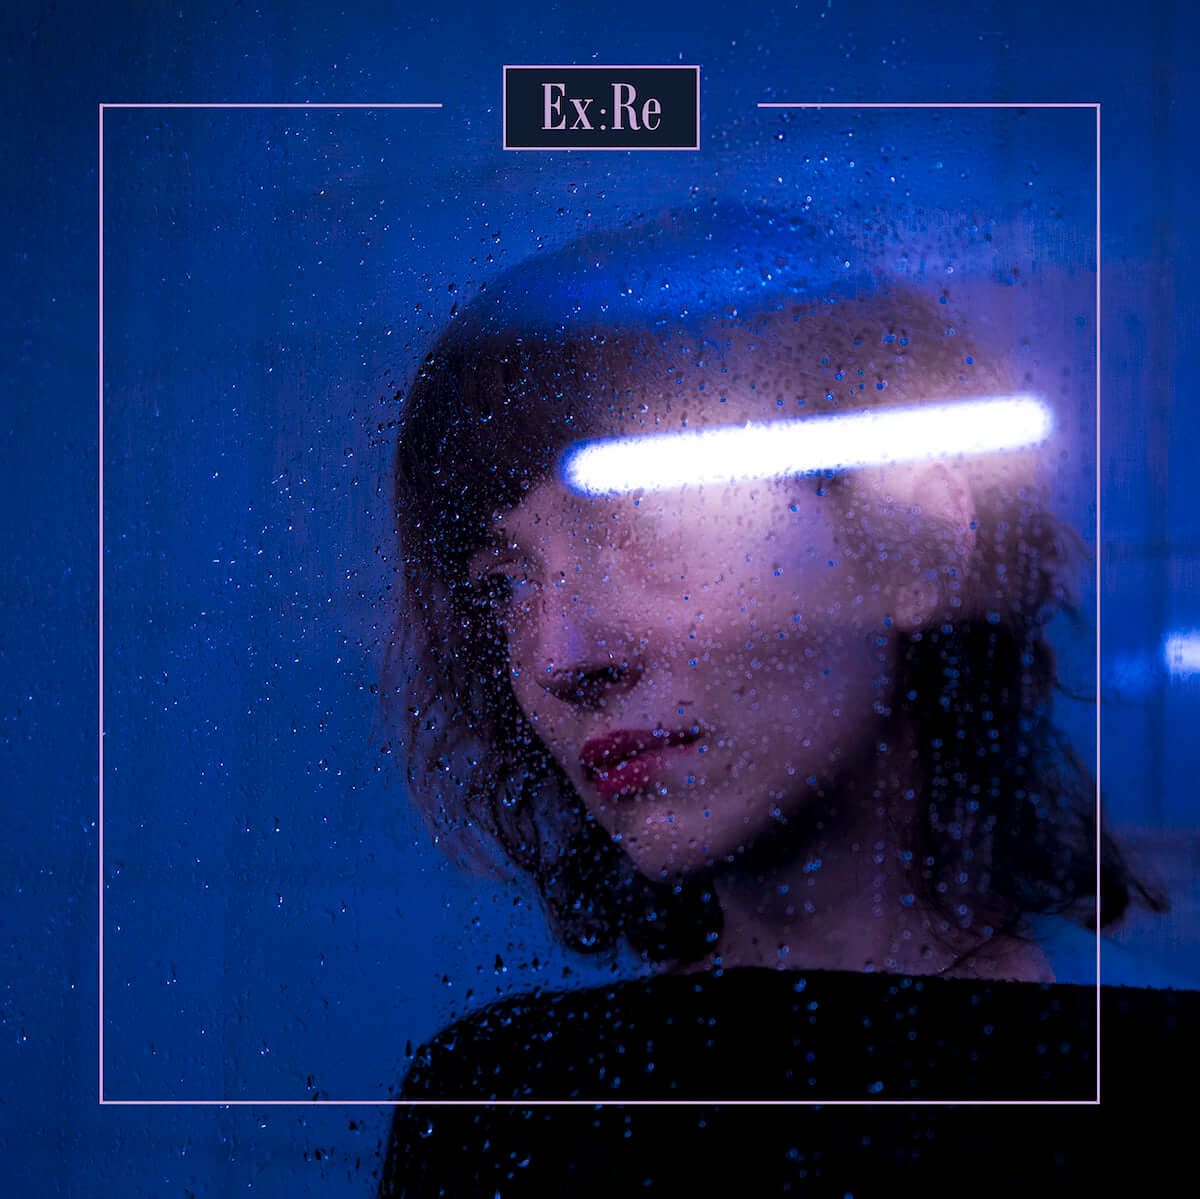 UKの名門インディレーベル〈4AD〉よりベイルート、エクス:レイの最新アルバムが本日同時発売 music190201-4ad-1-1200x1199